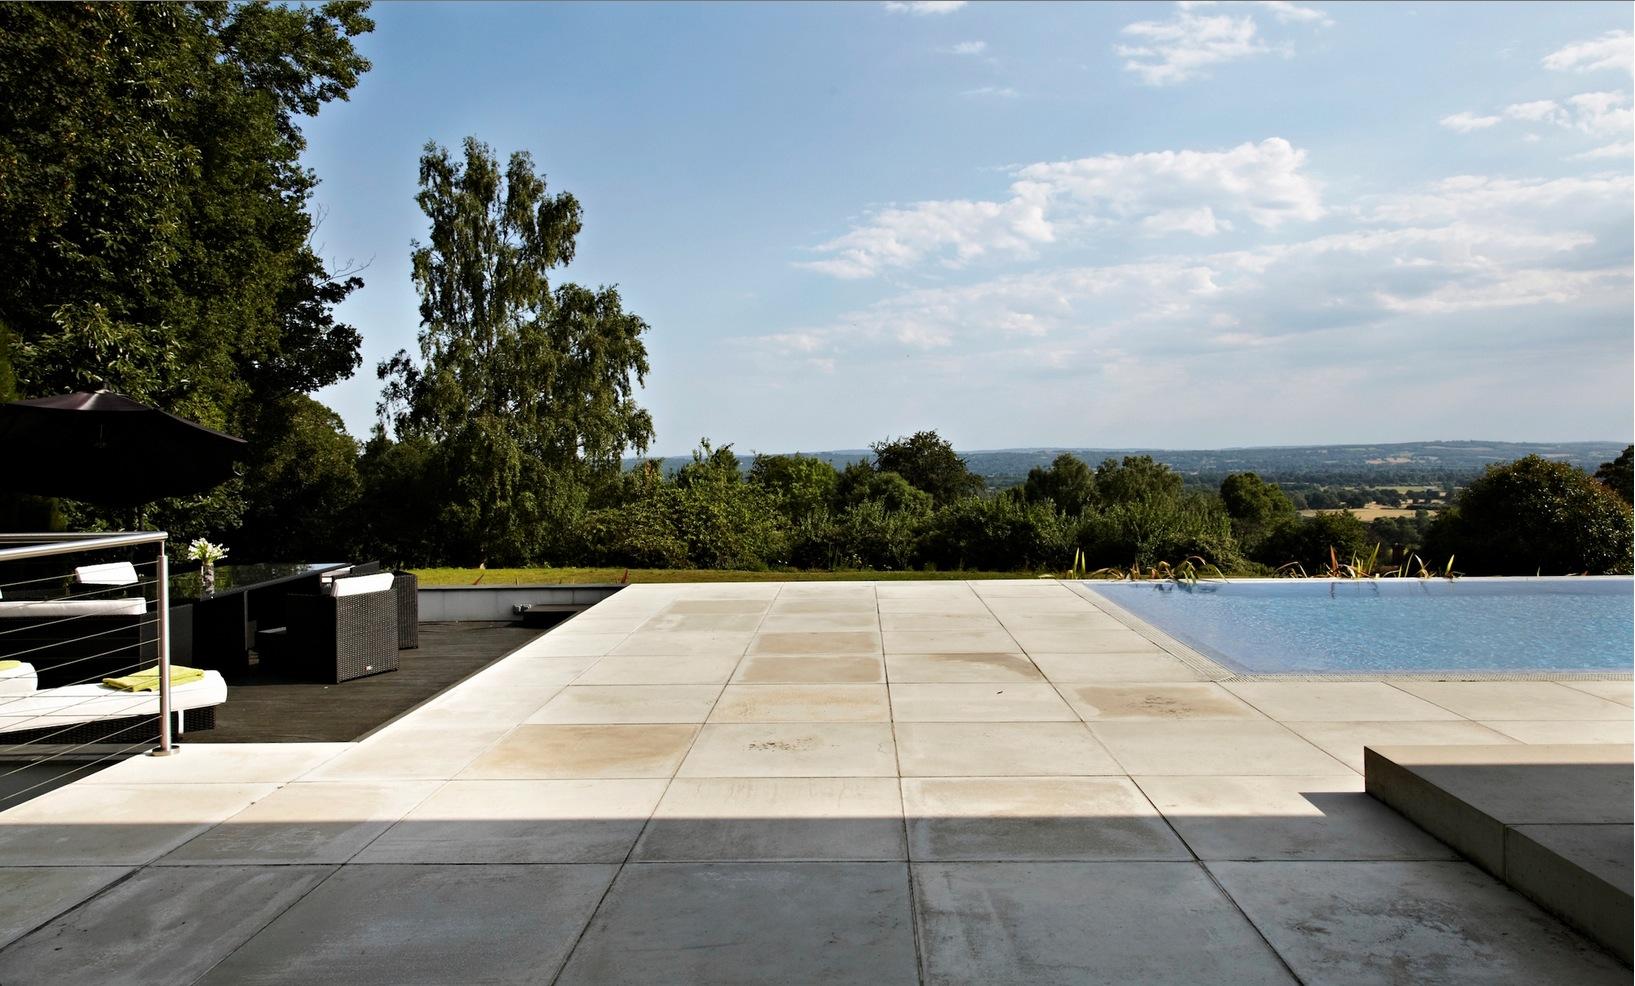 Concrete Patio And Seating Area Interior Design Ideas